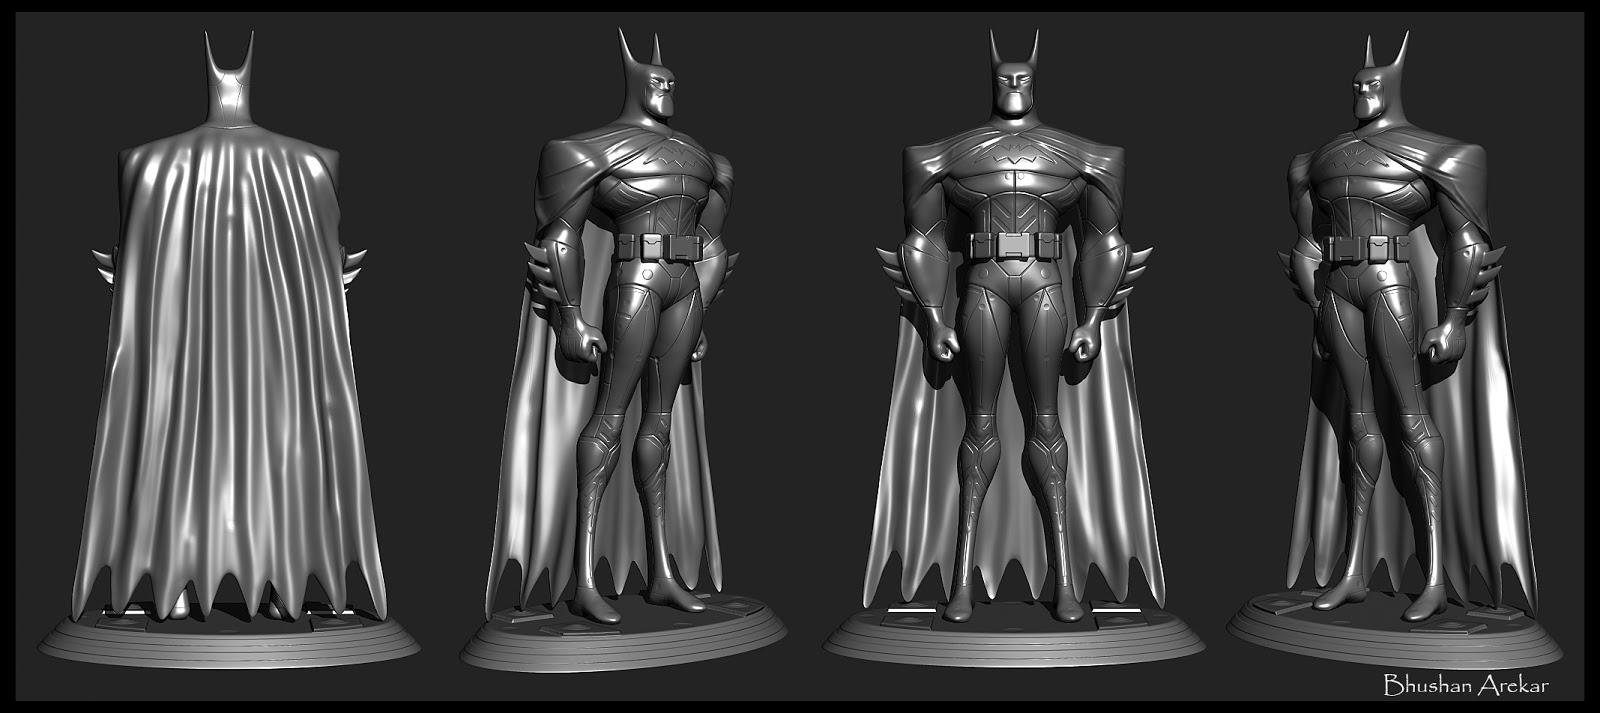 http://3.bp.blogspot.com/-d0VGUBEZ2rM/Ufy3RkK0B6I/AAAAAAAADCo/9tPxqll7BkA/s1600/Batman.jpg